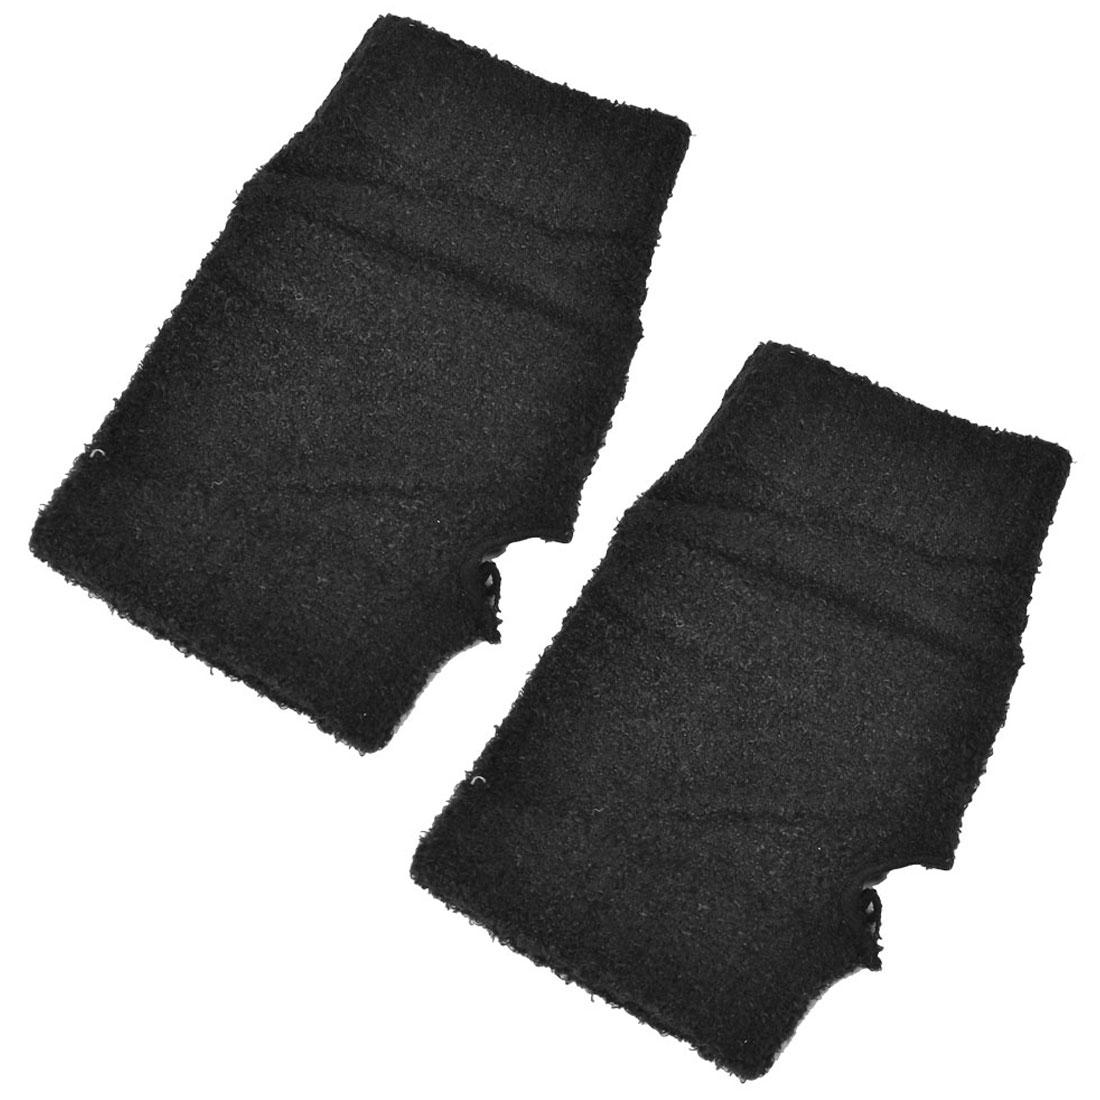 Women Soft Warm Acrylic Elastic Wrist Warmers Gloves Black 2pcs